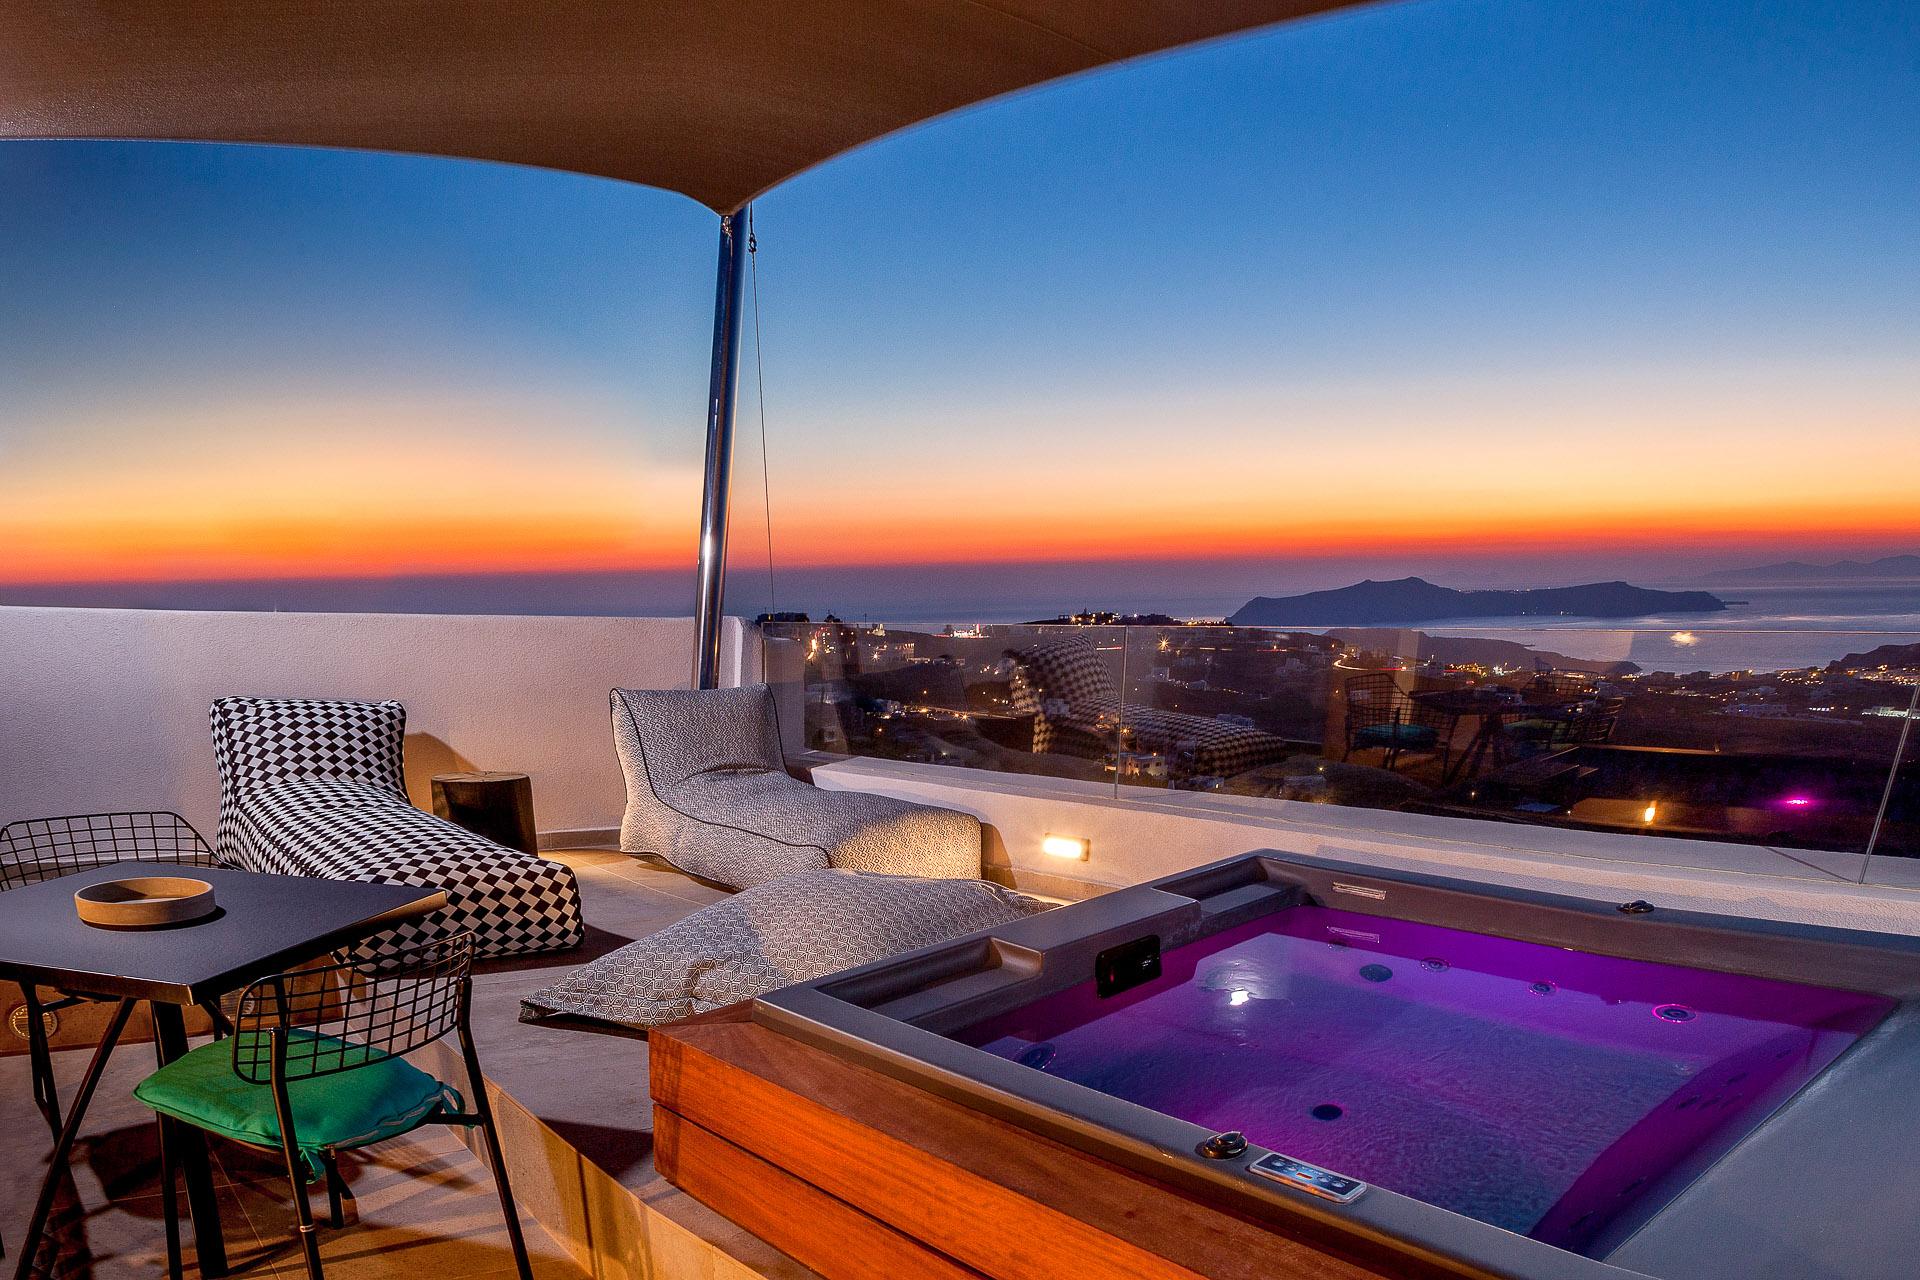 santorini booking, airbnb santorini, santorini luxury villas, chic hotel santorini, best hotels in santorini, volcano view hotel santorini, santorini hotels,